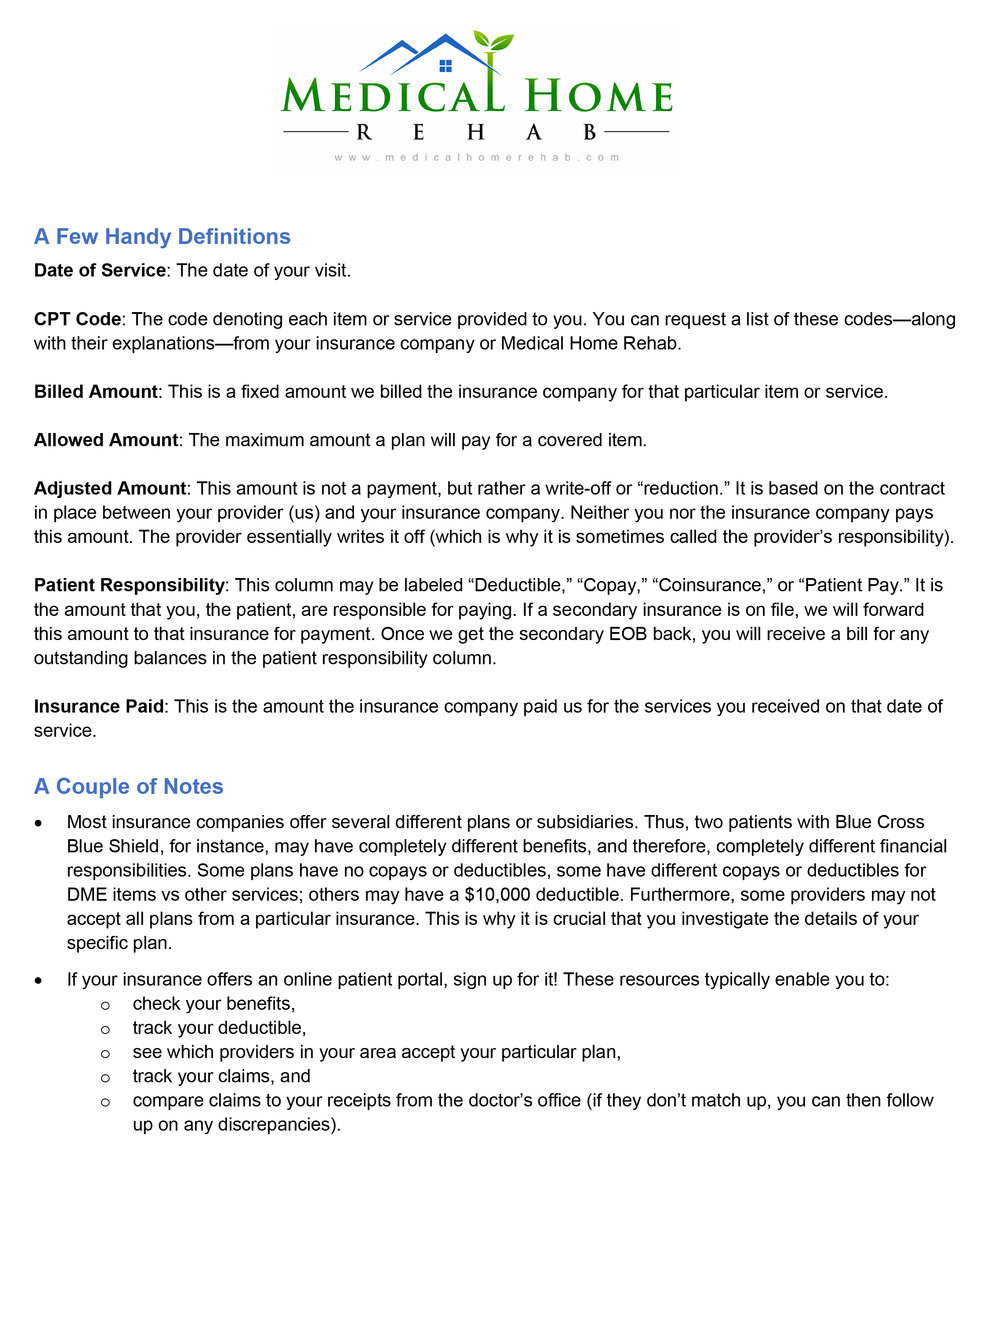 Patients Guide-3.jpg